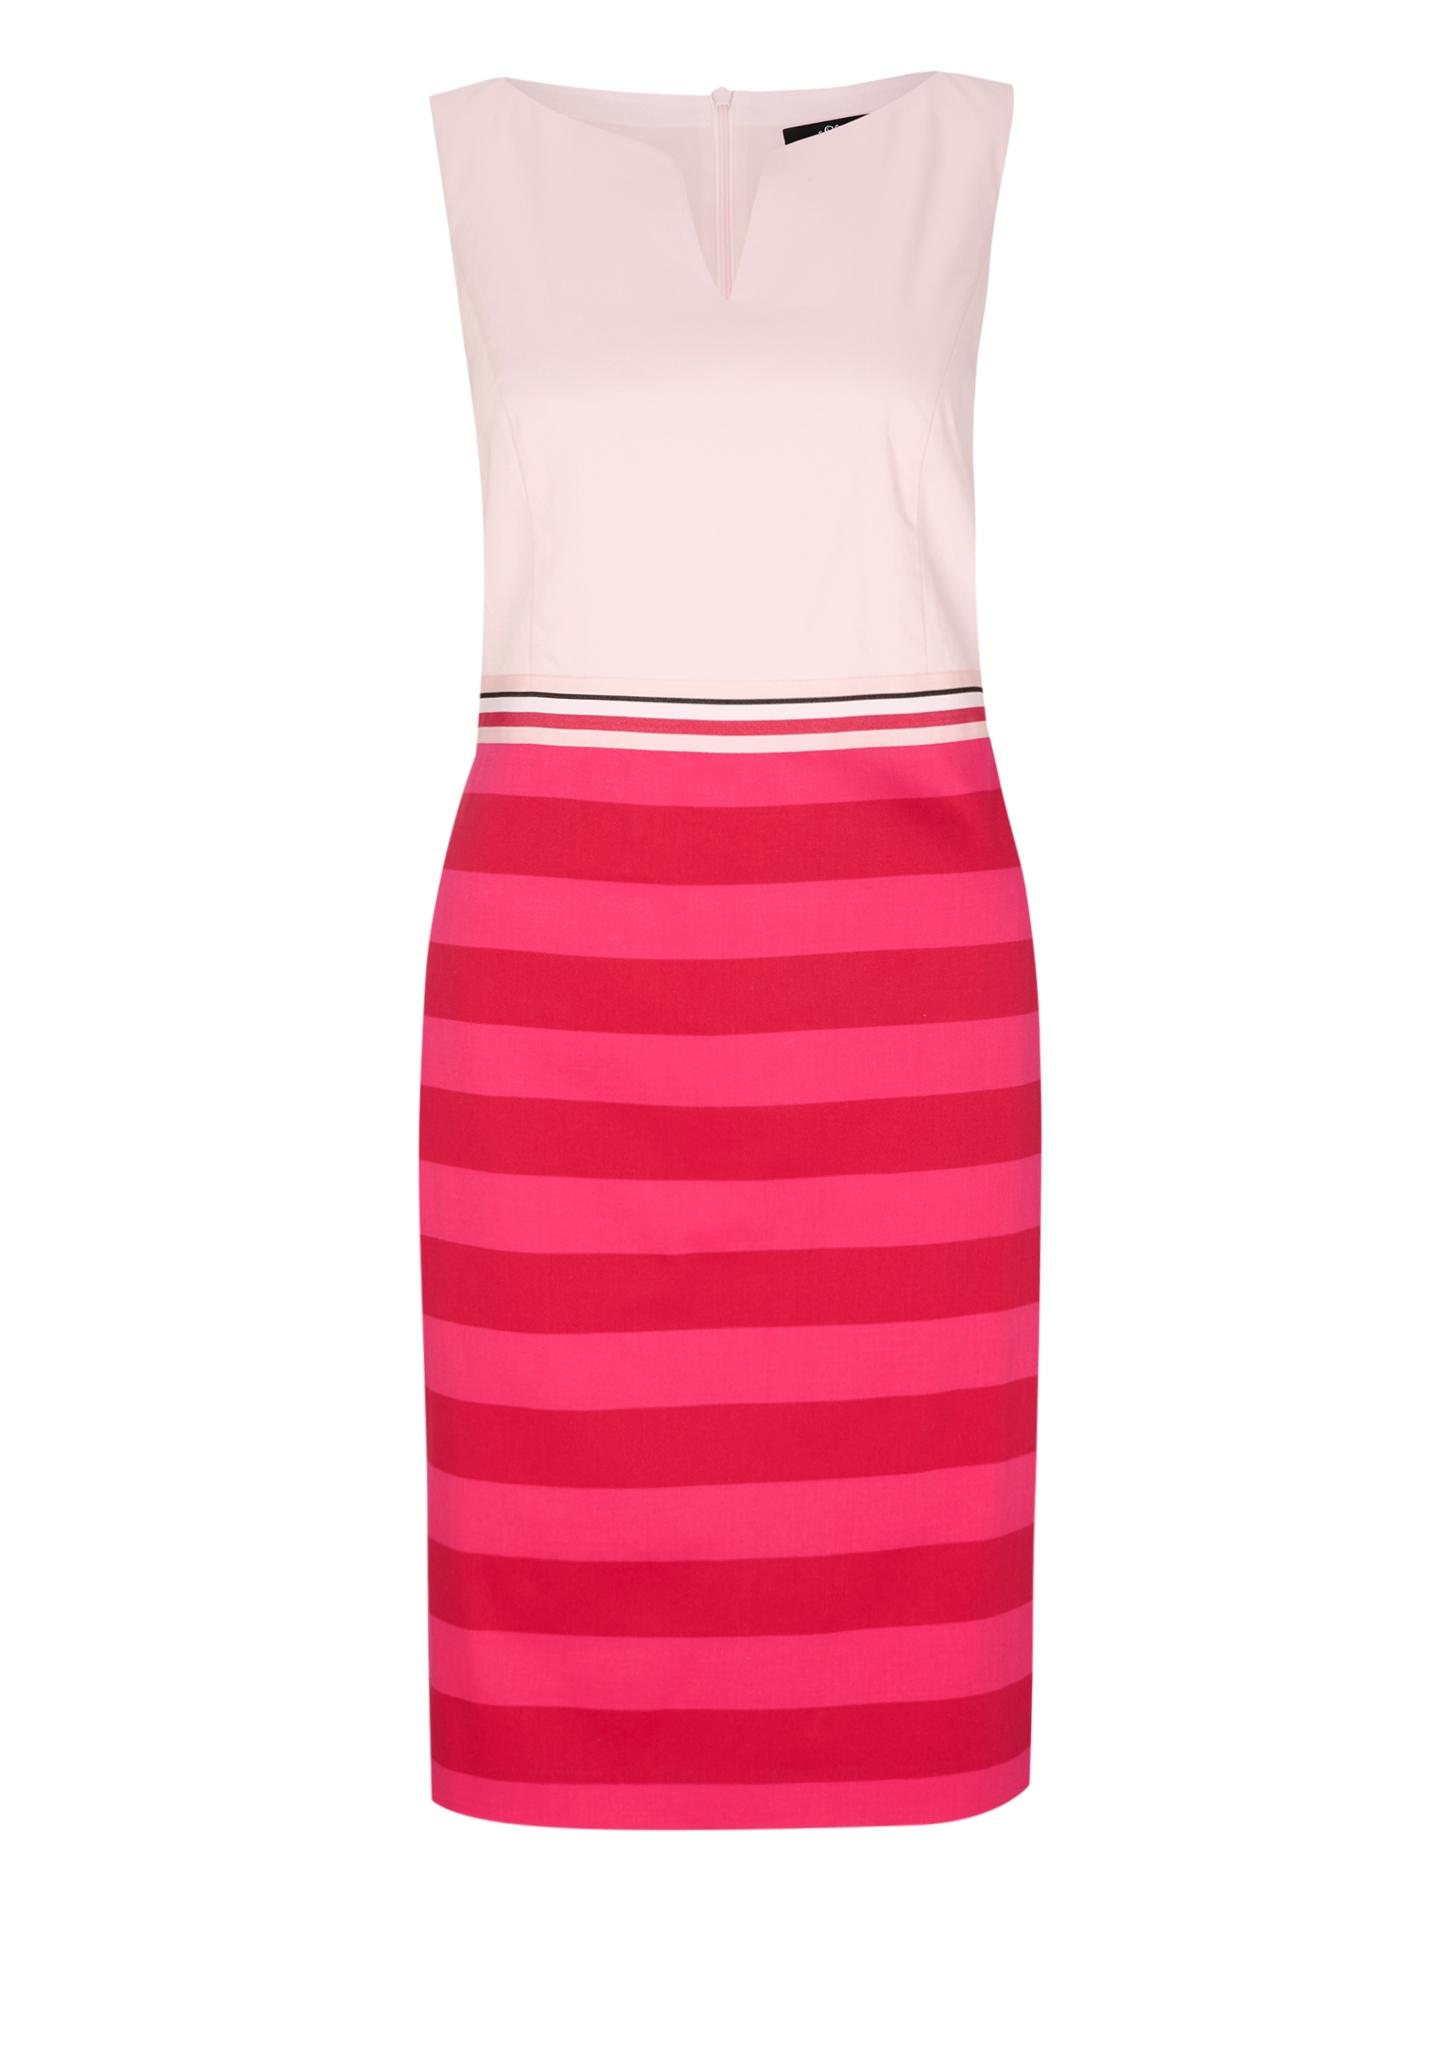 Image of Businnesskleid